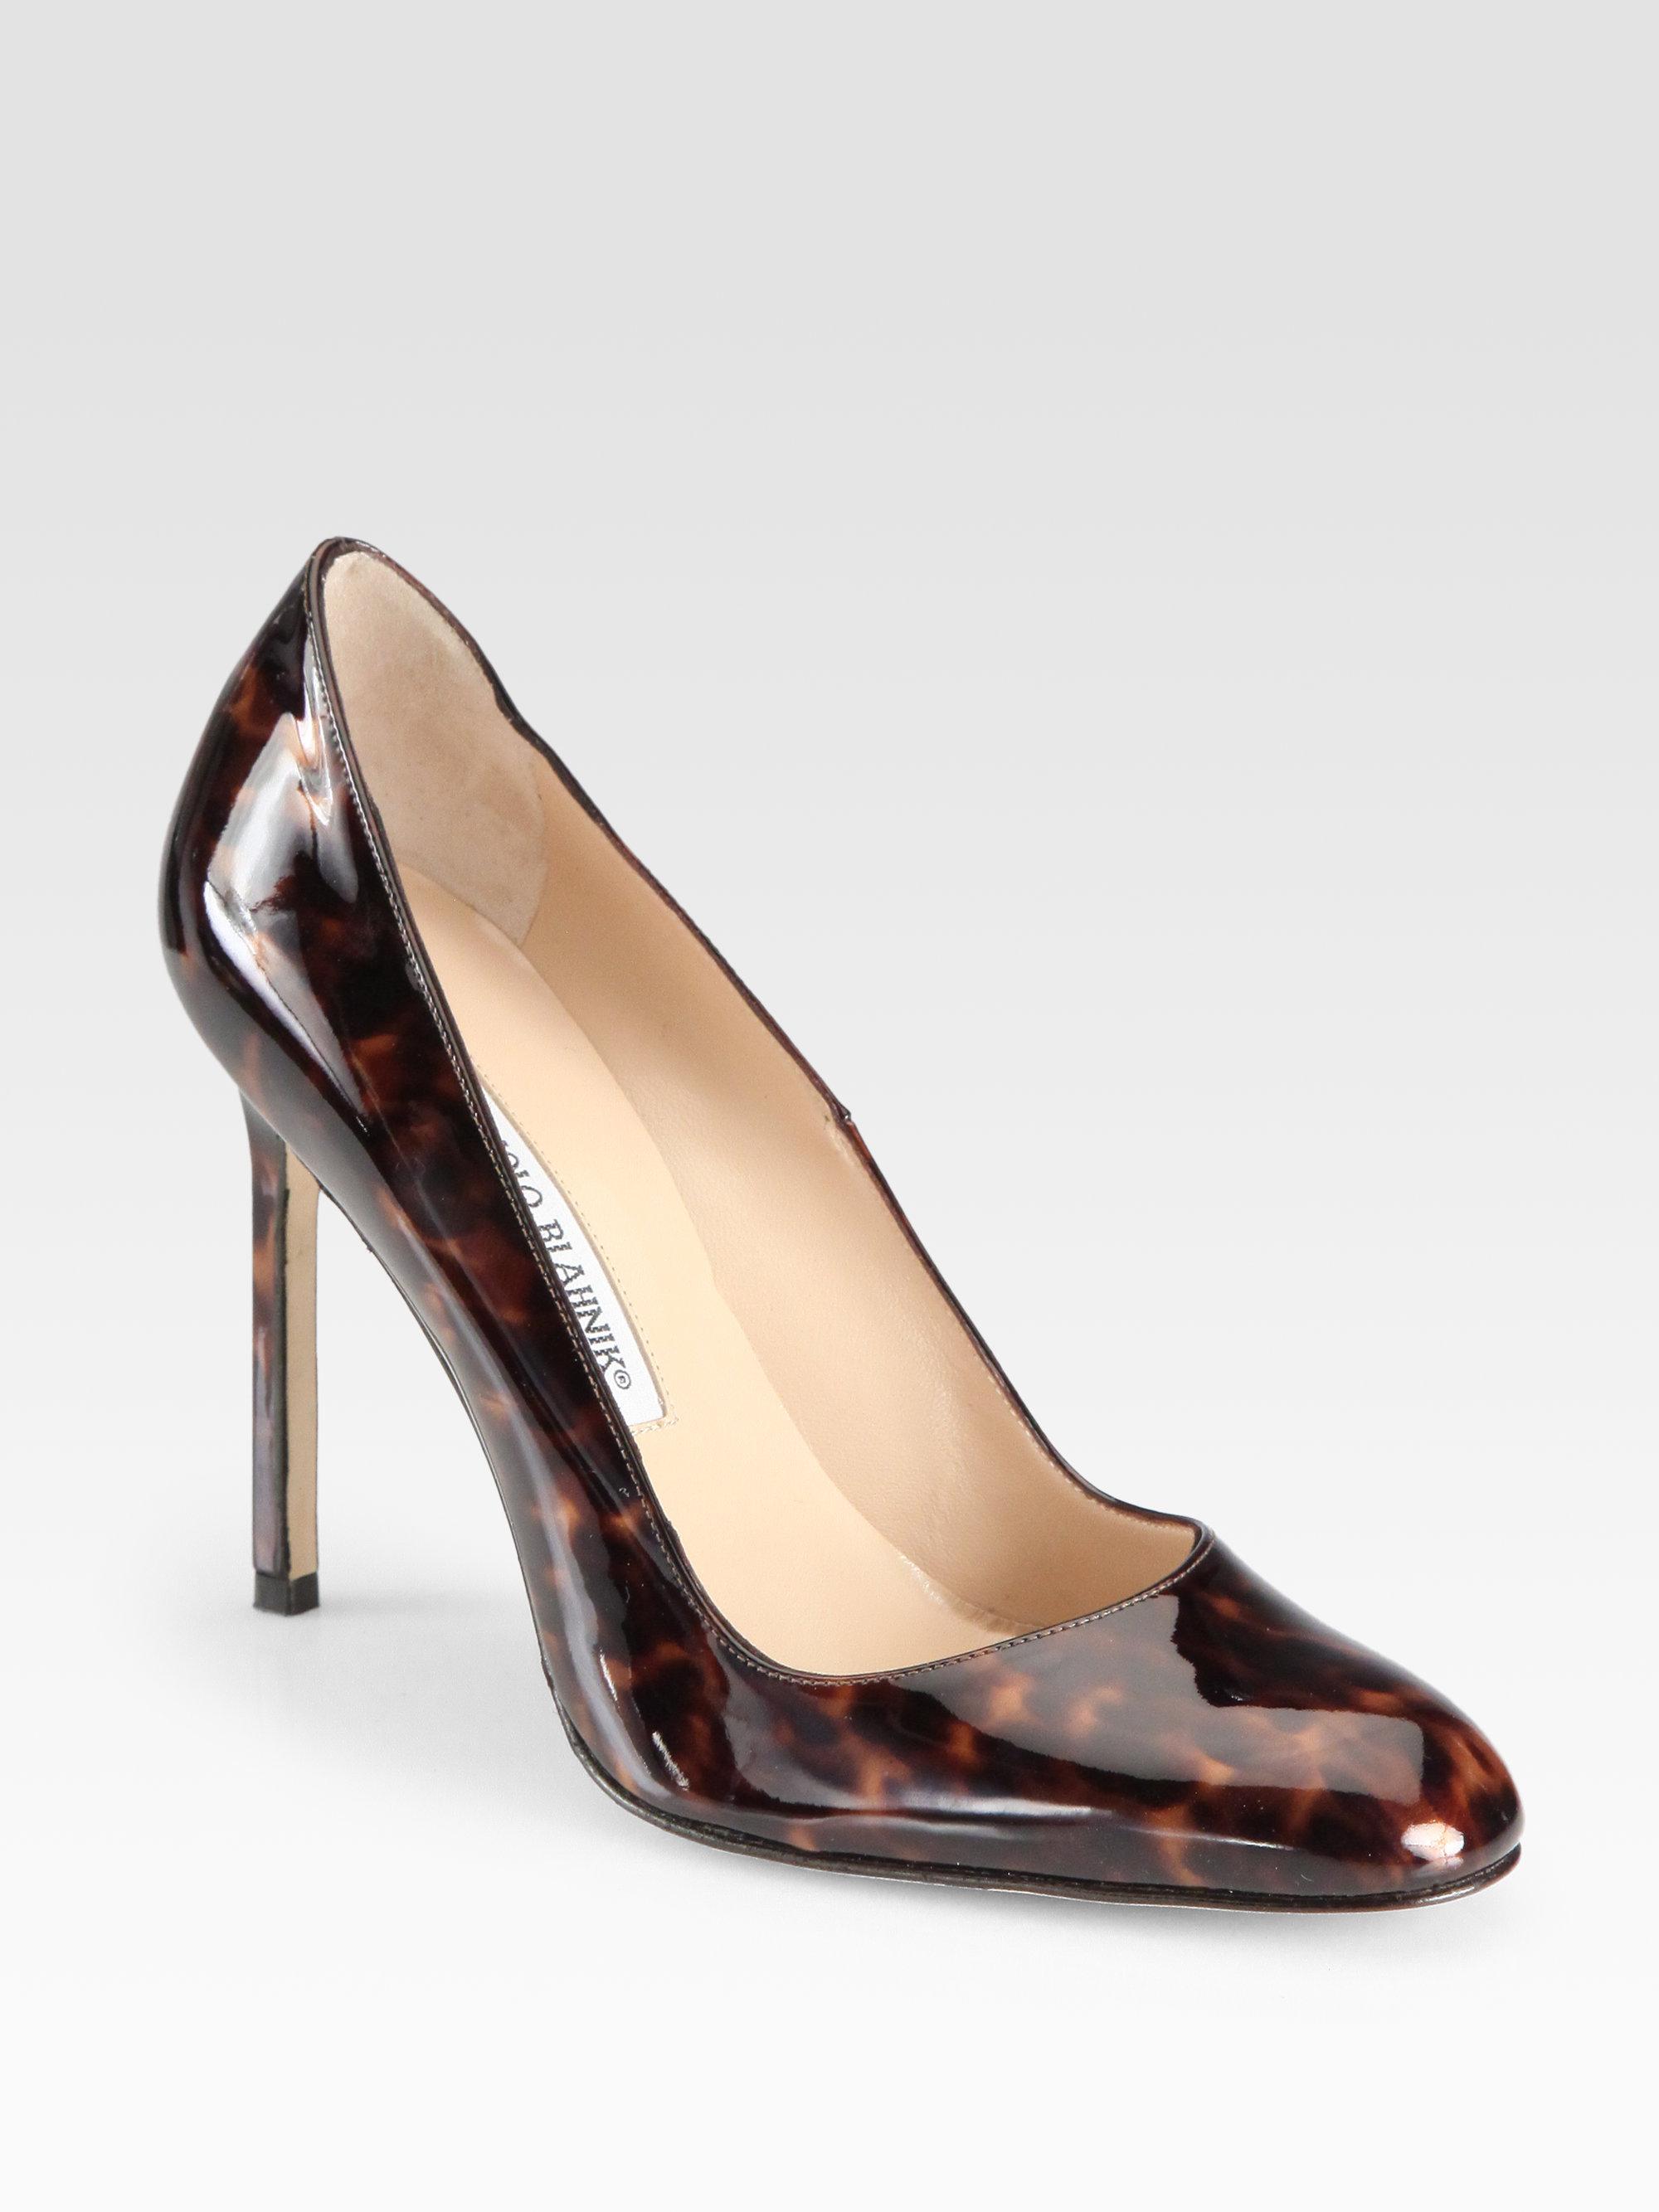 Manolo blahnik bb tortoiseprint patent leather pumps in for Shoe designer manolo blahnik